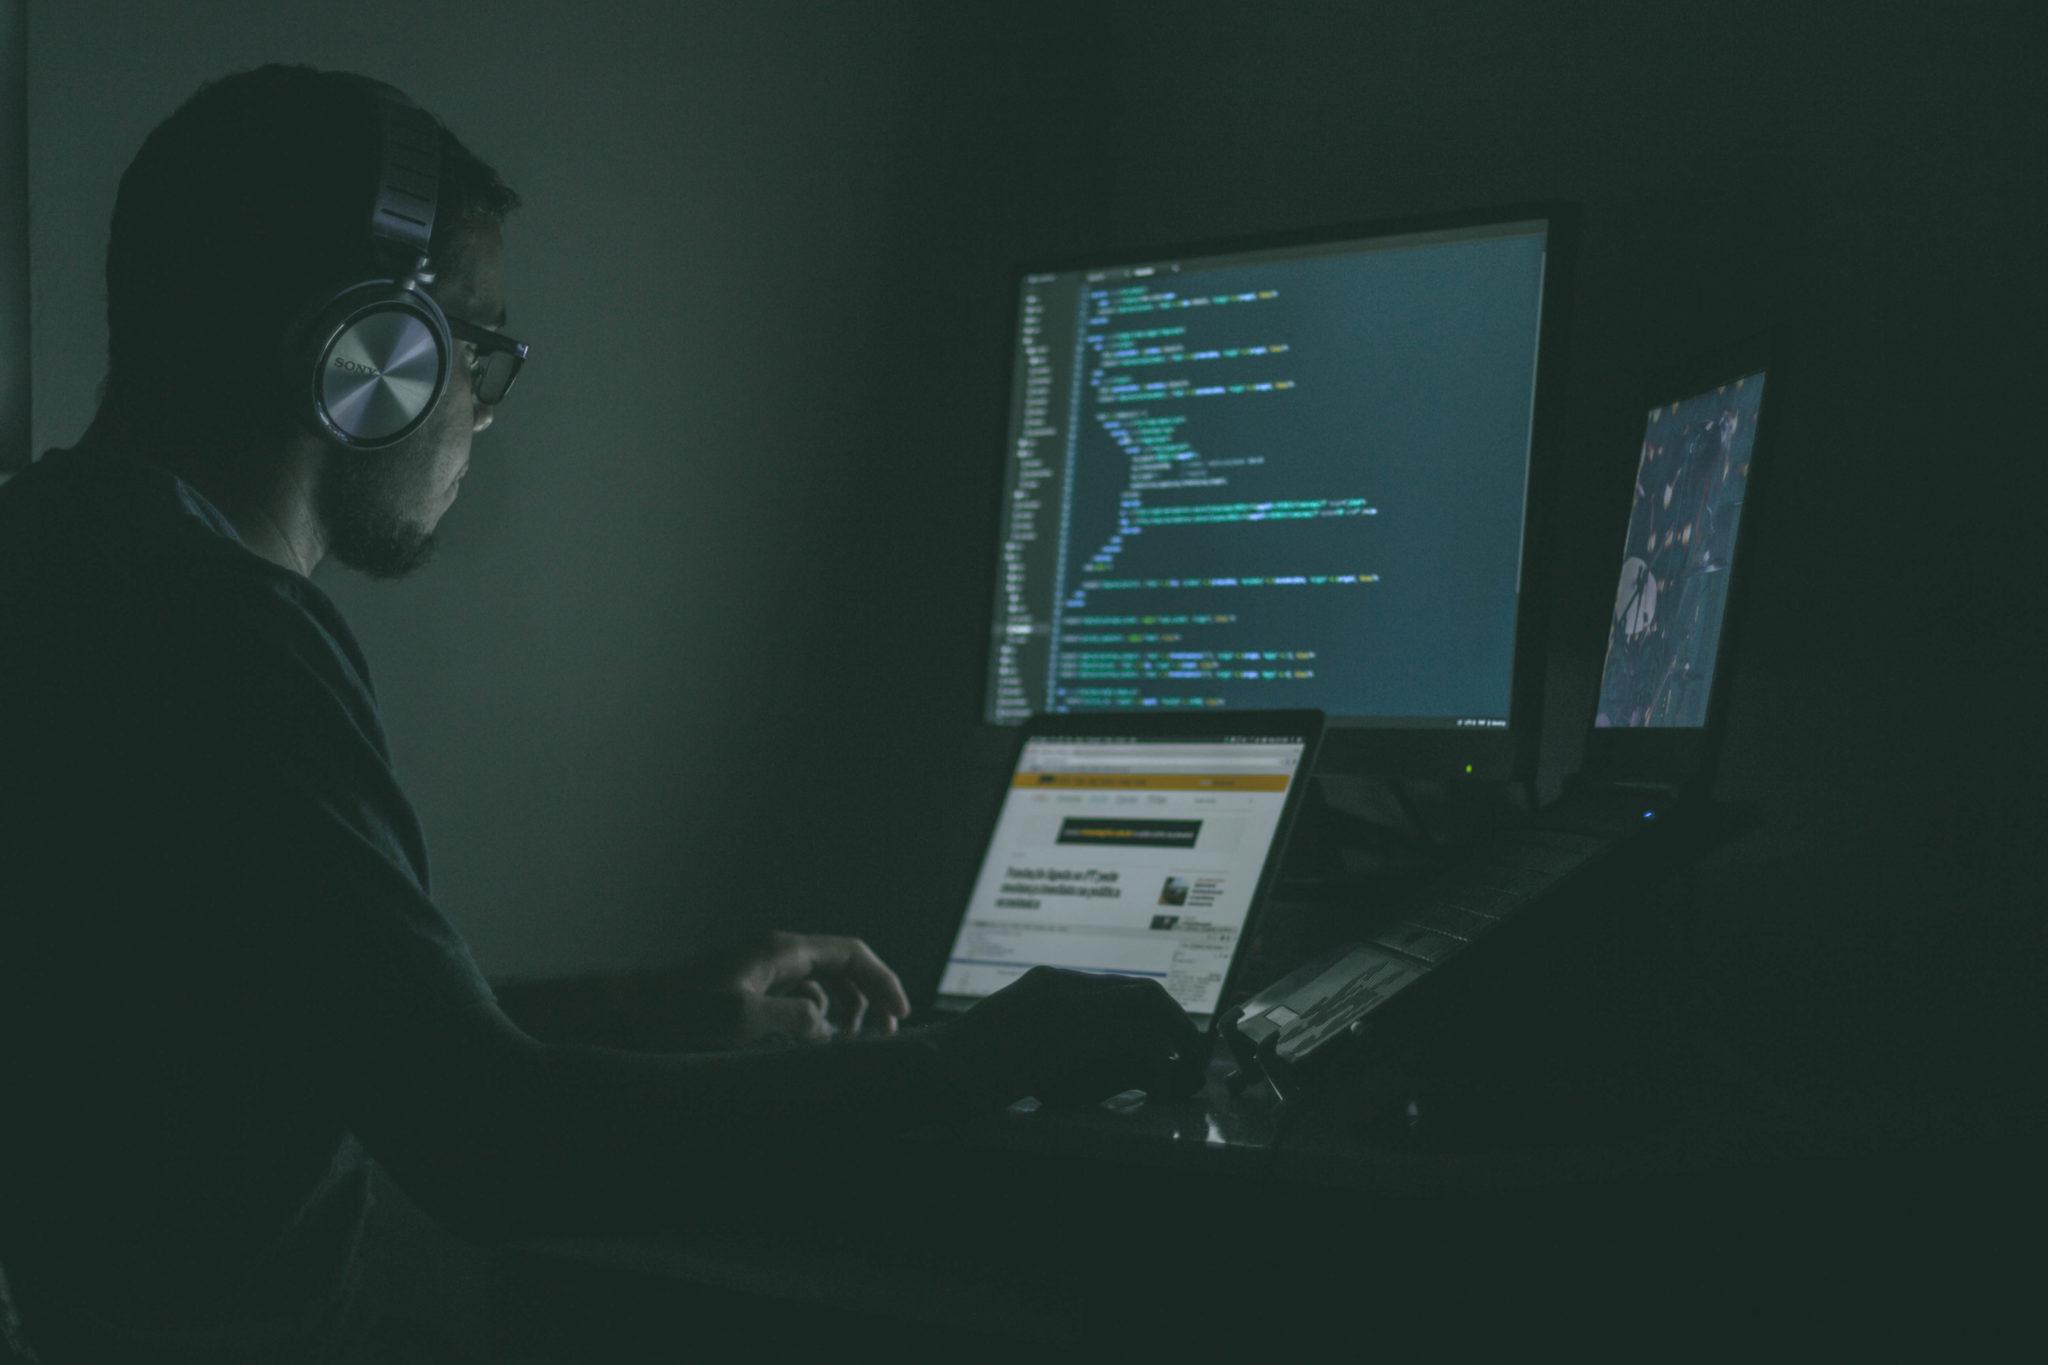 software engineer working in his computer